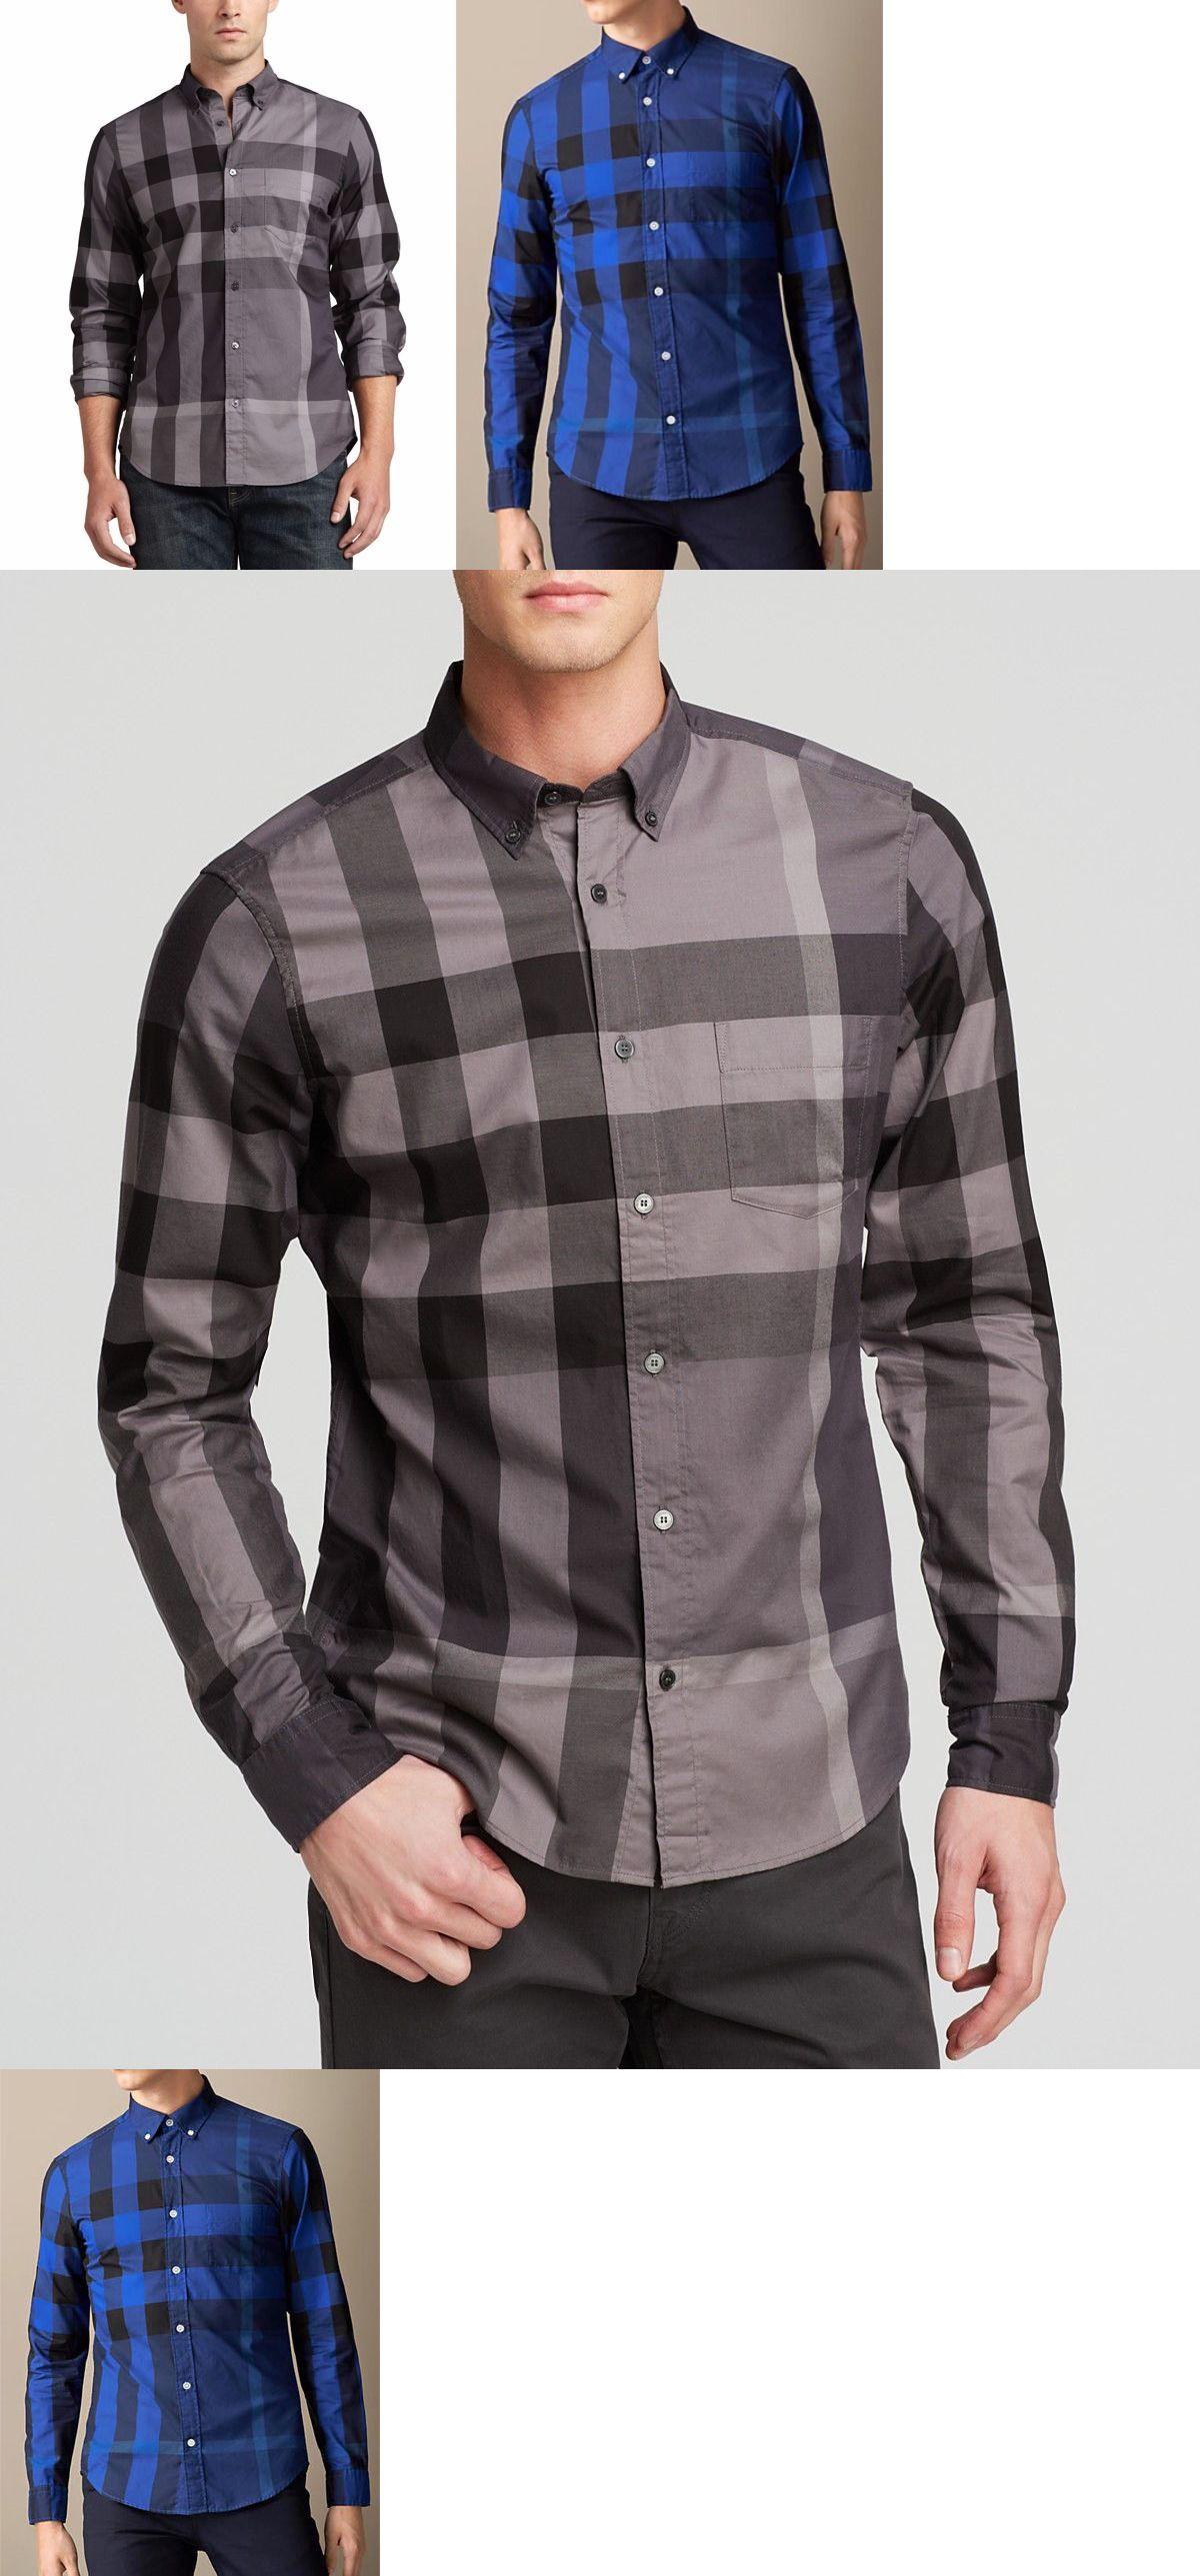 8f0daf2e319 Dress Shirts 57991: Burberry Brit Men S Charcoal Blue Button Down Exploded  Nova Check Shirt S,M,L,Xl -> BUY IT NOW ONLY: $129.99 on eBay!